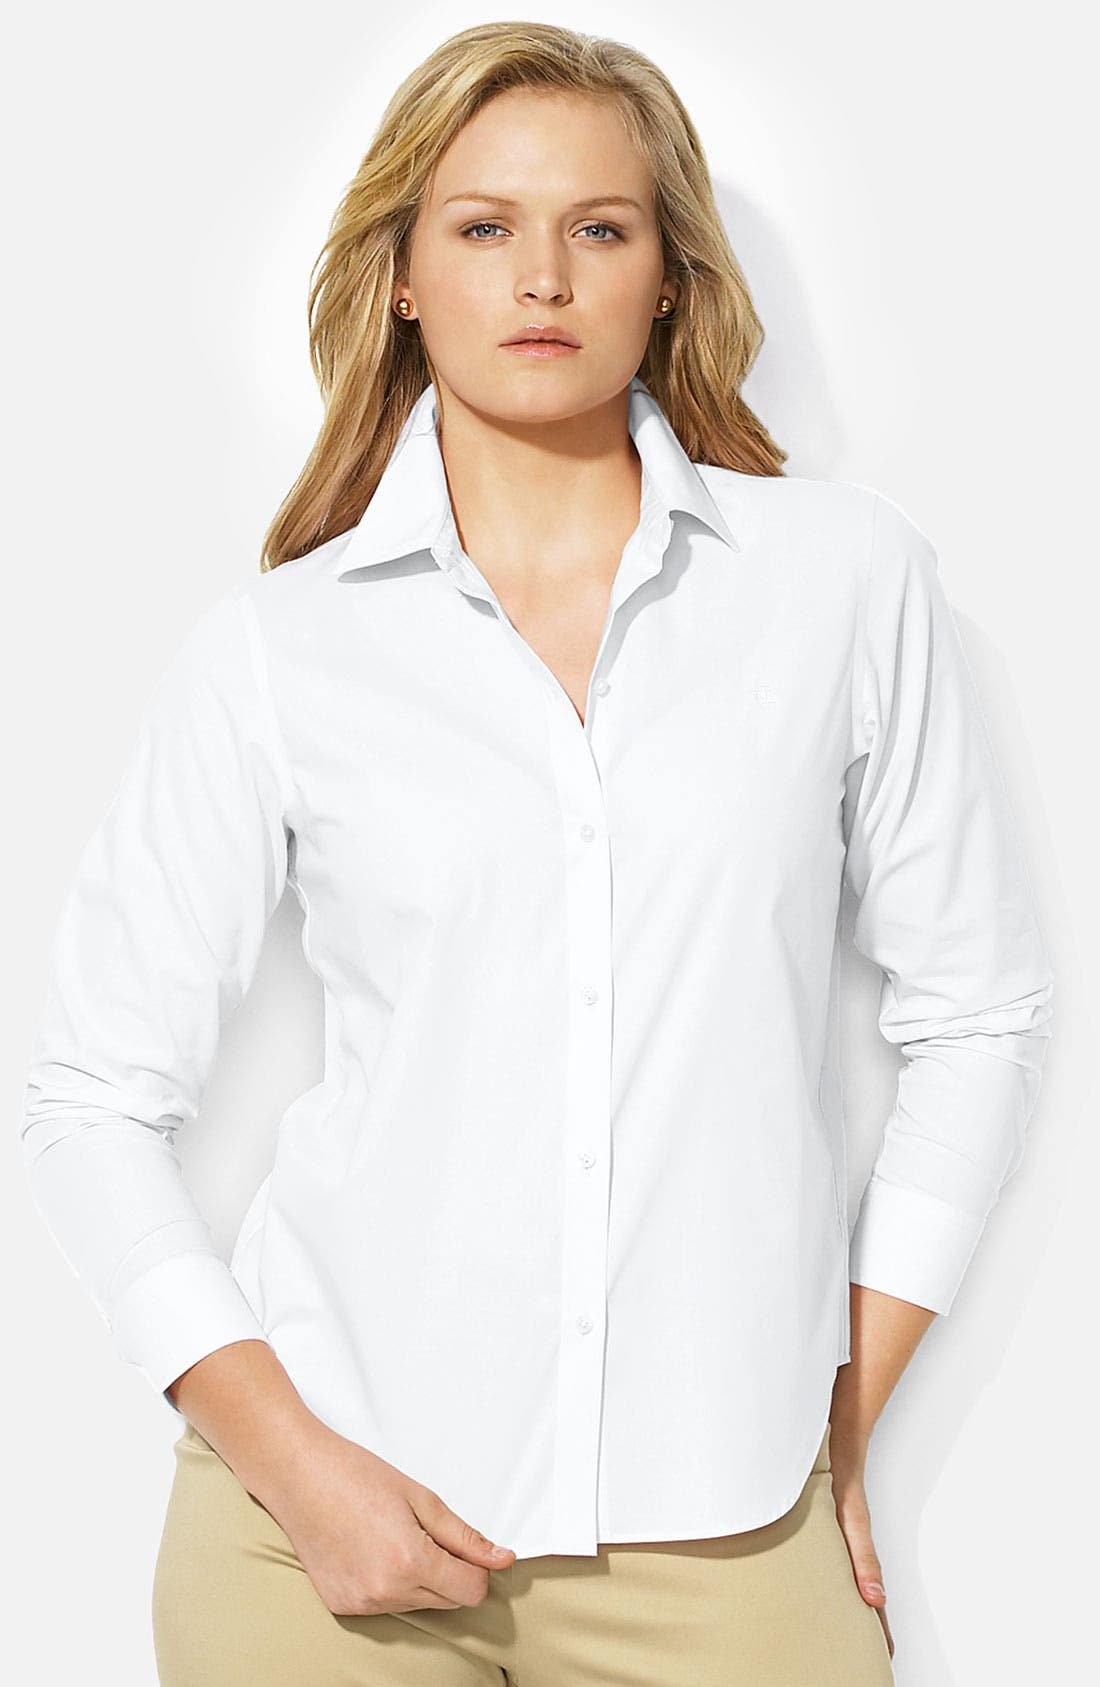 Alternate Image 1 Selected - Lauren Ralph Lauren Button Up Shirt (Plus)